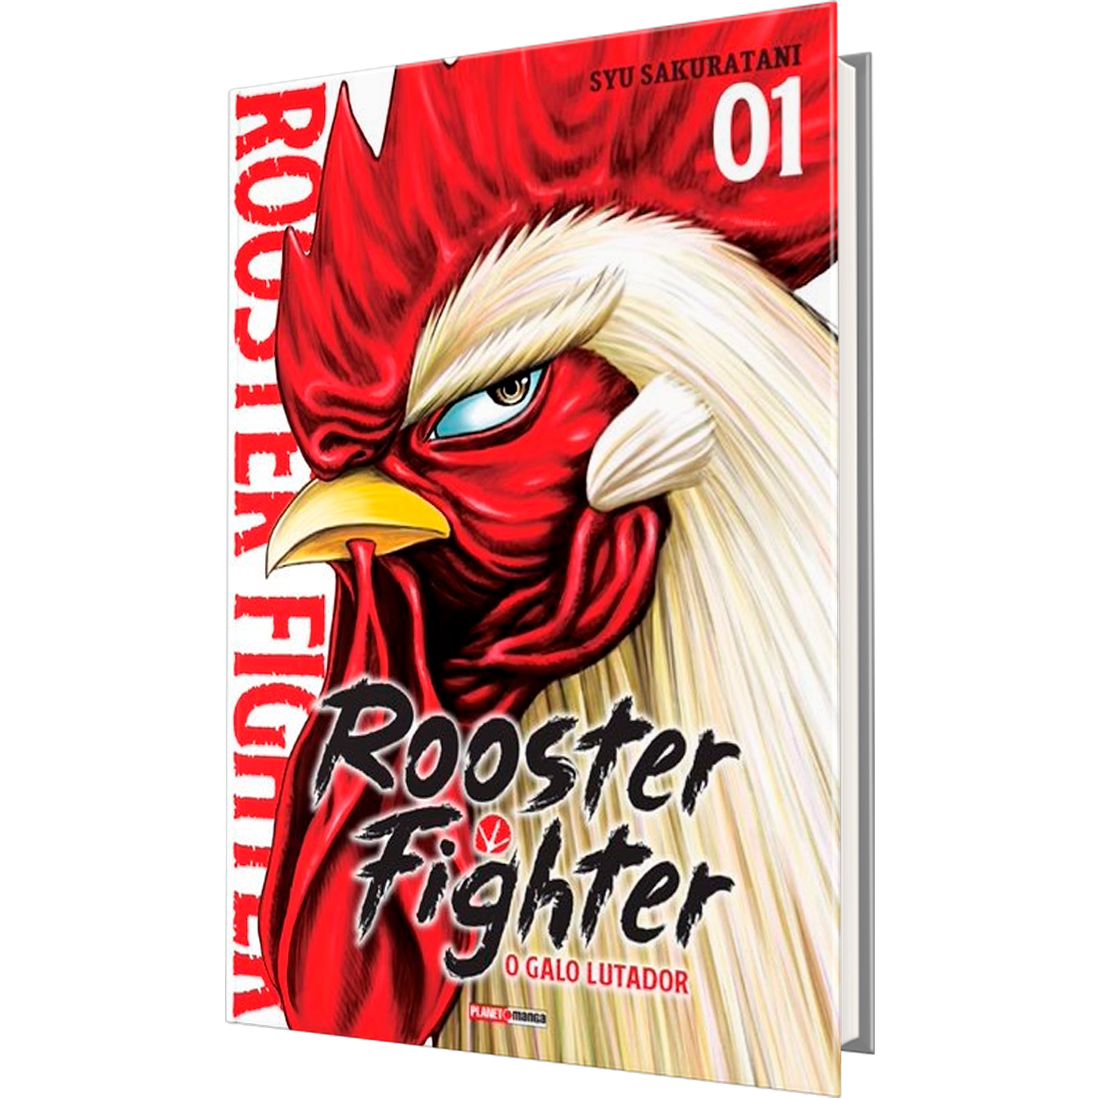 Rooster Fighter - O Galo Lutador Vol. 1